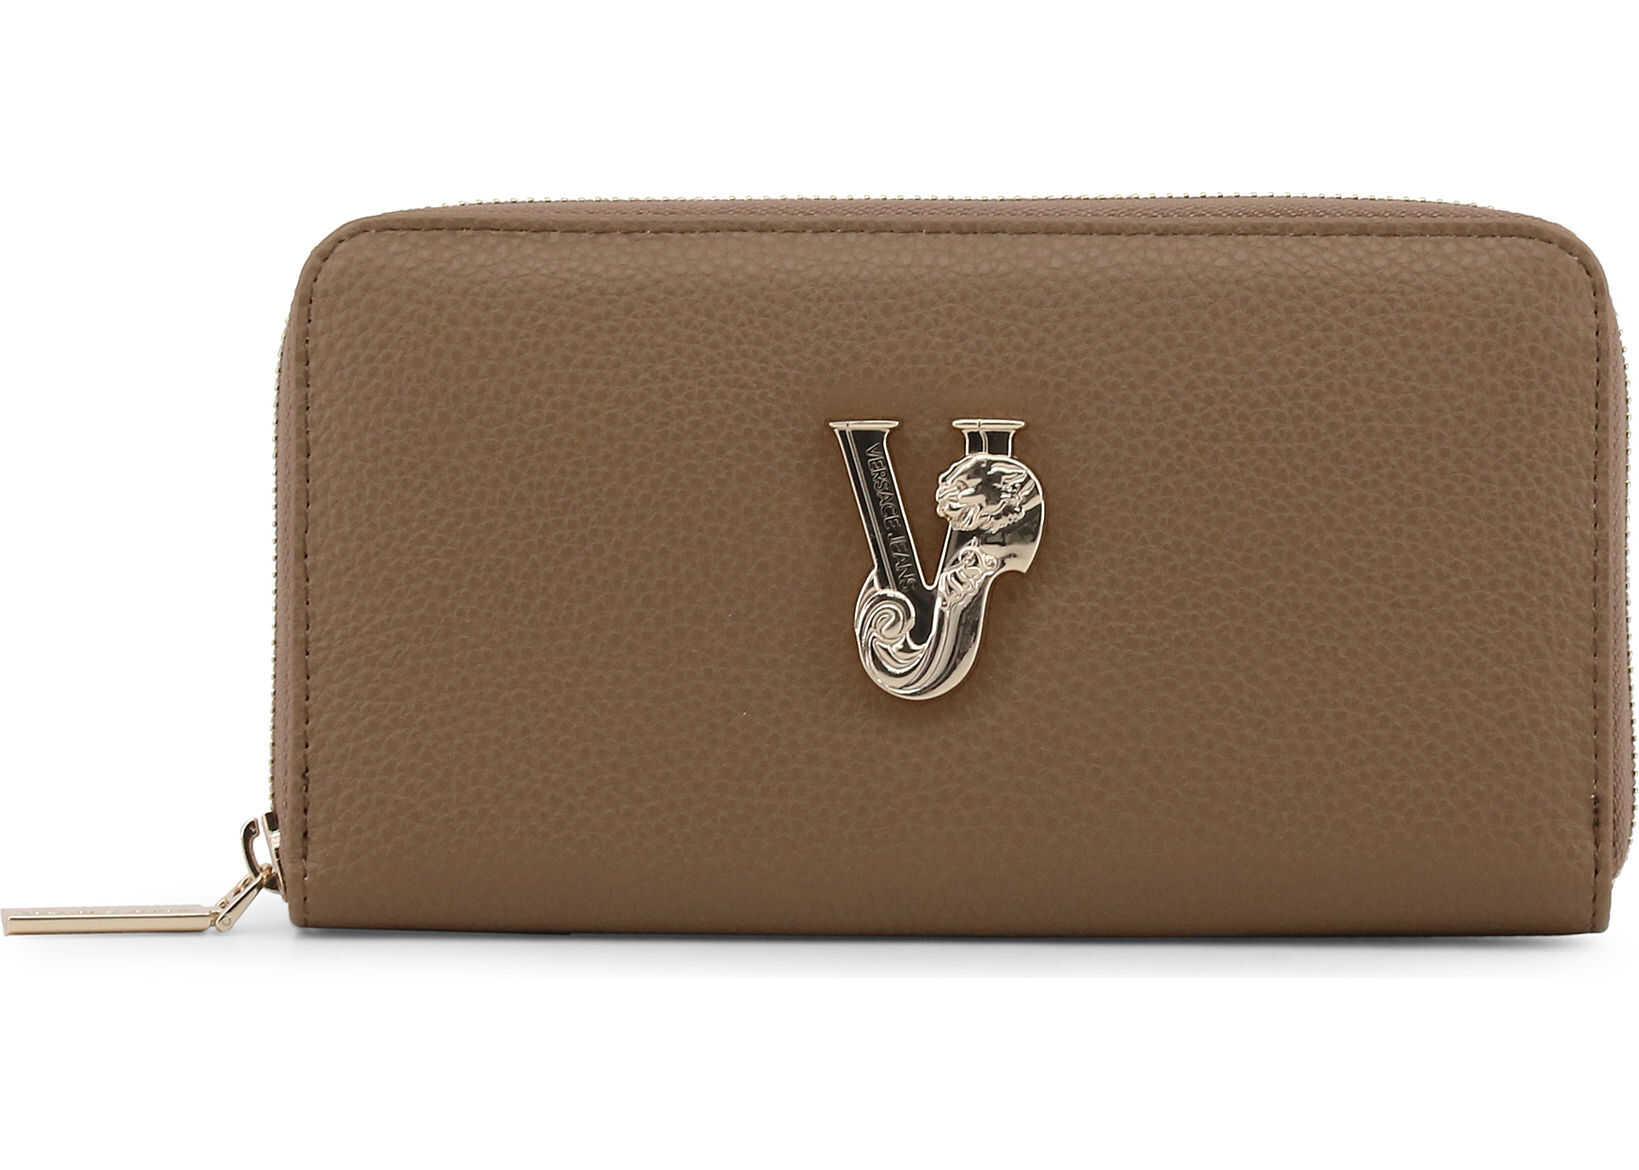 Versace Jeans E3Vsbpv1_70790 Brown